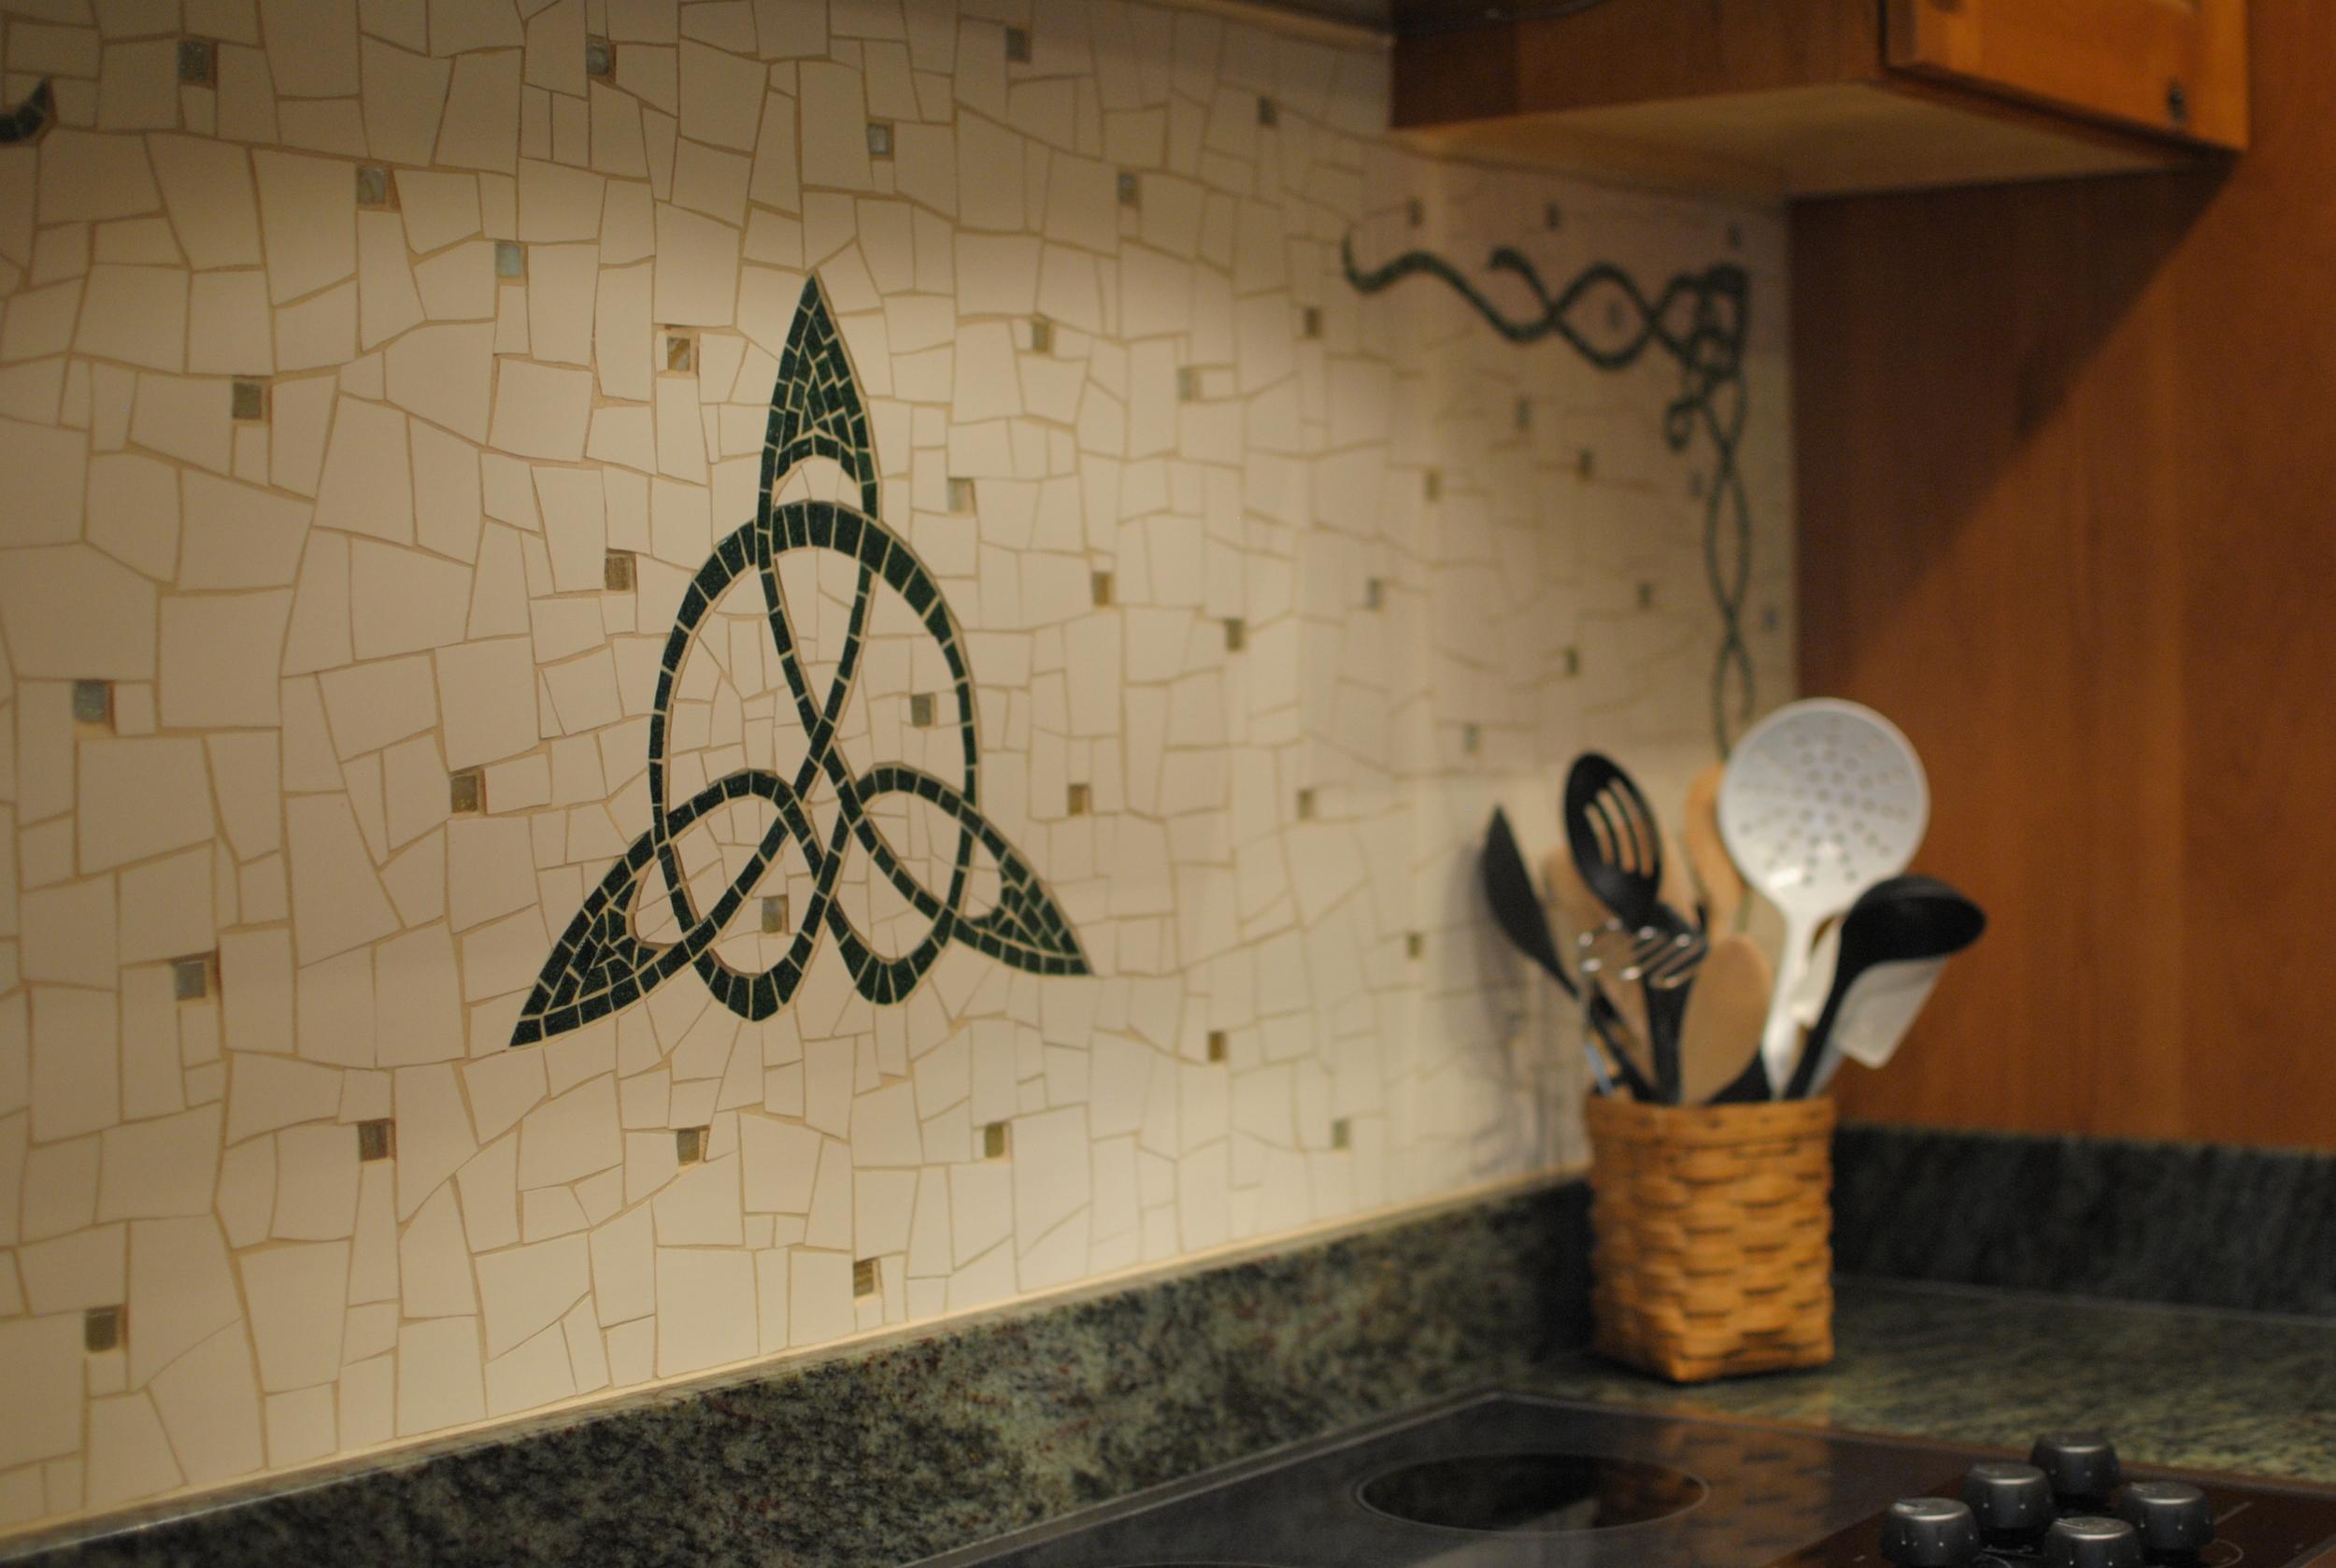 Celtic mosaic kitchen backsplash detail